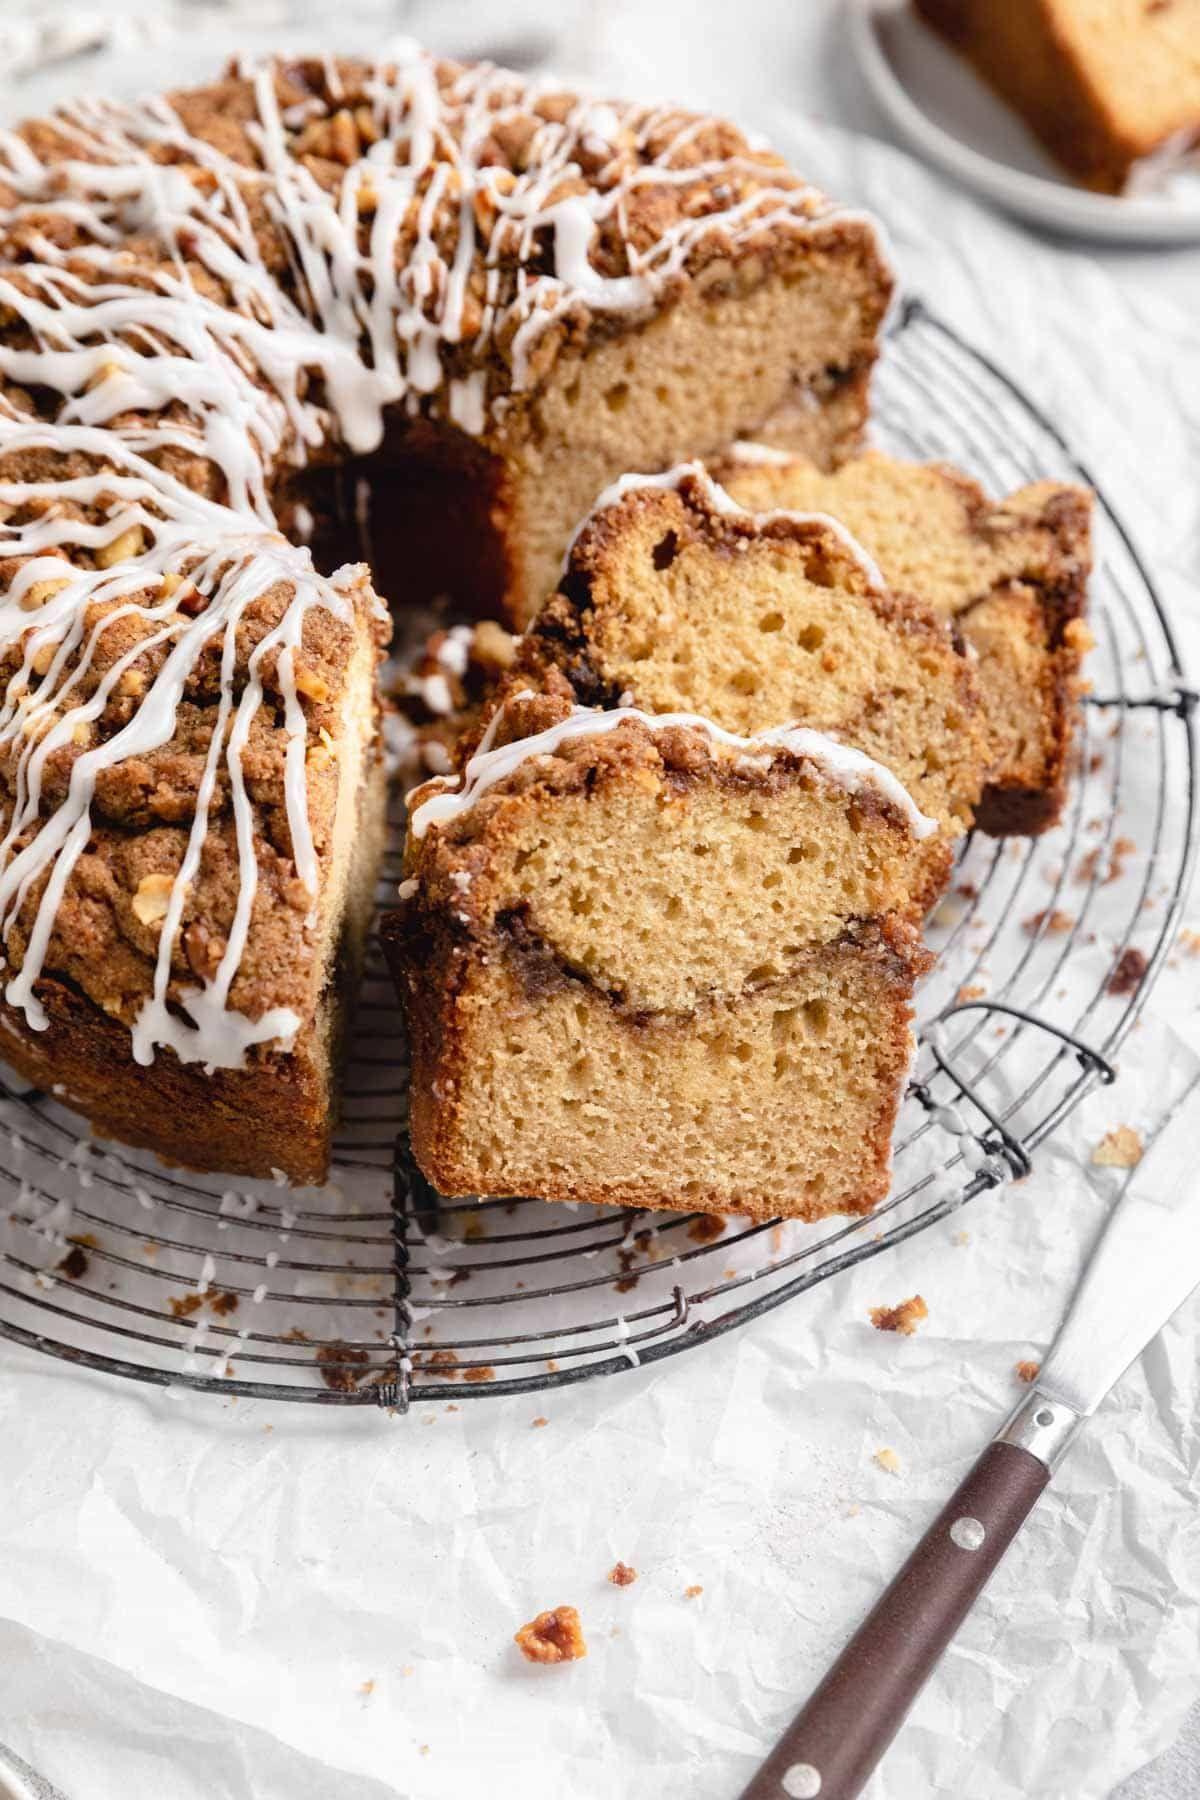 Classic Sour Cream Coffee Cake Broma Bakery Recipe In 2020 Broma Bakery Coffee Cake Coffee Cake Recipes